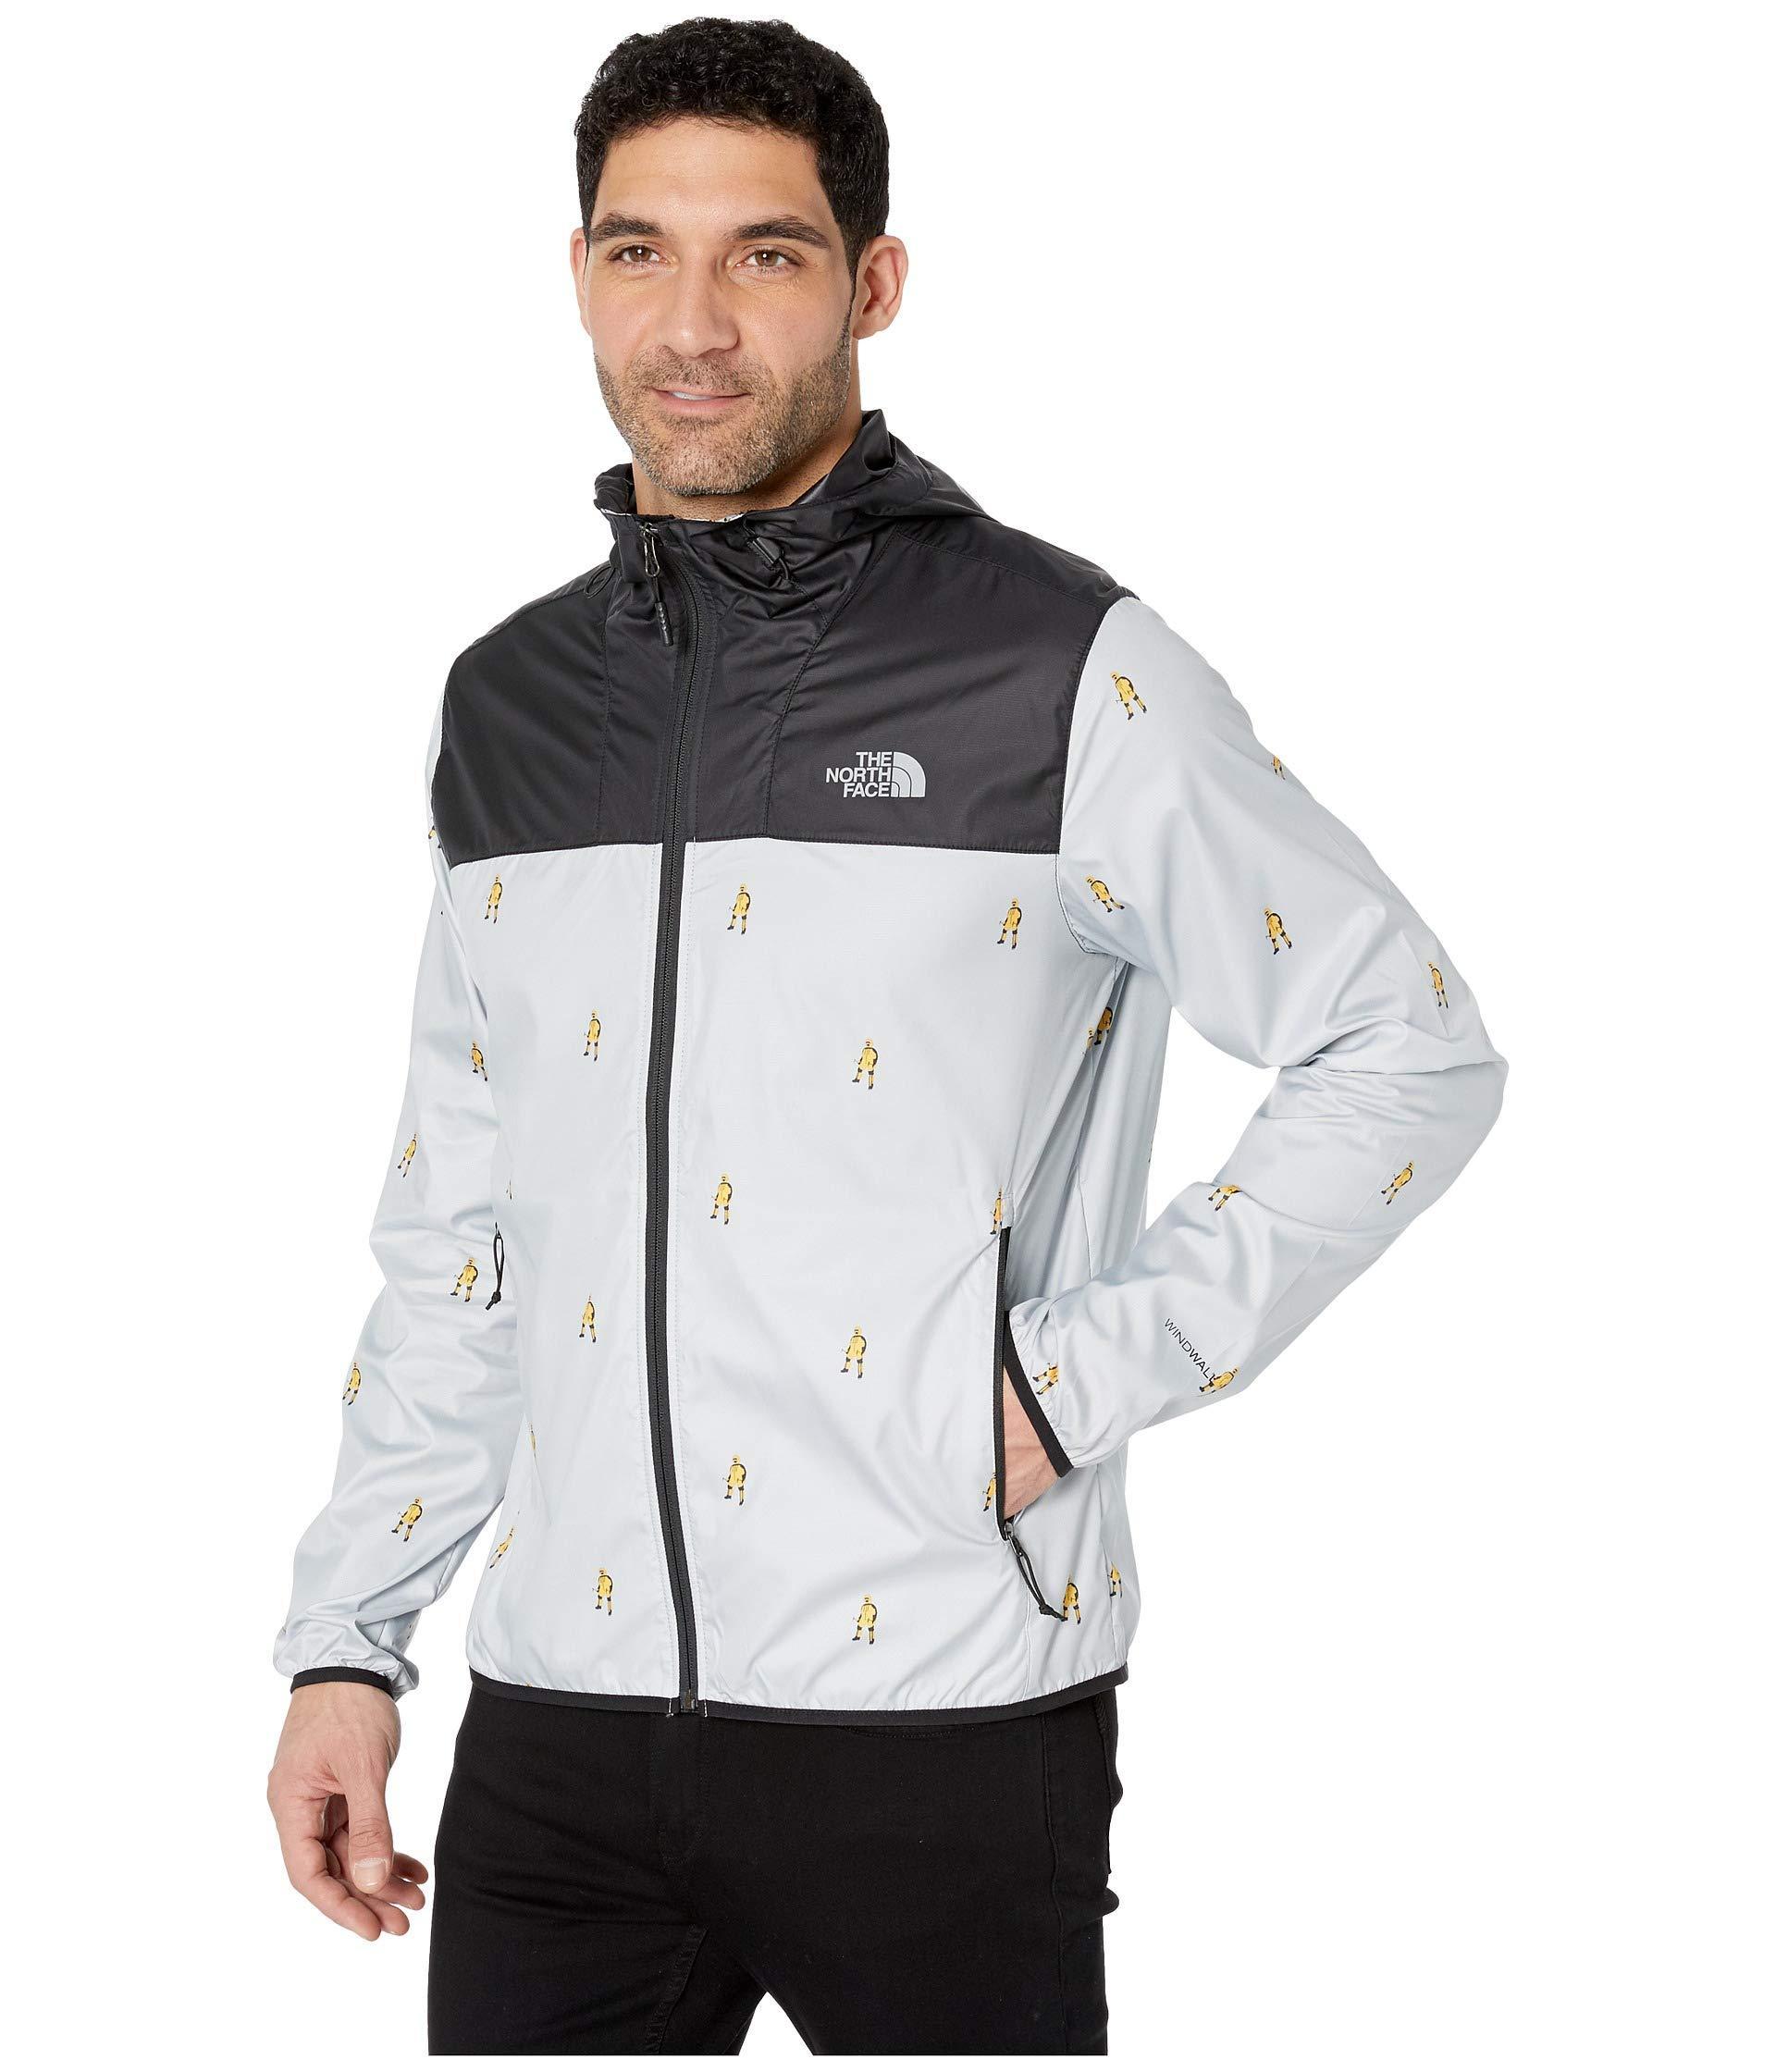 32ec7154c964 The North Face. Gray Printed Cyclone Hoodie (tnf Black Tossed Logo Print)  Men s Sweatshirt